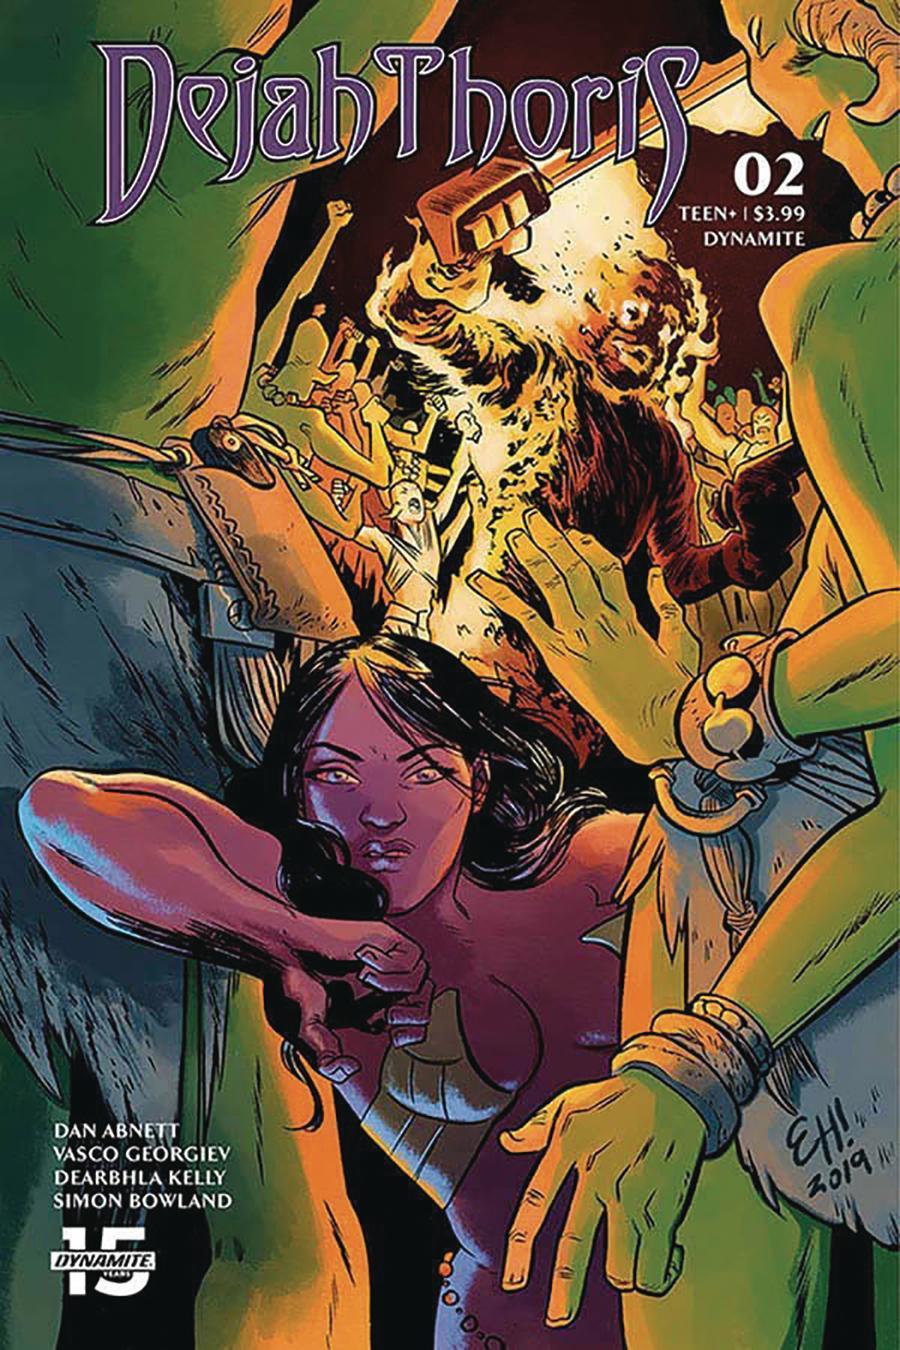 Dejah Thoris Vol 3 #2 Cover D Variant Erica Henderson Cover